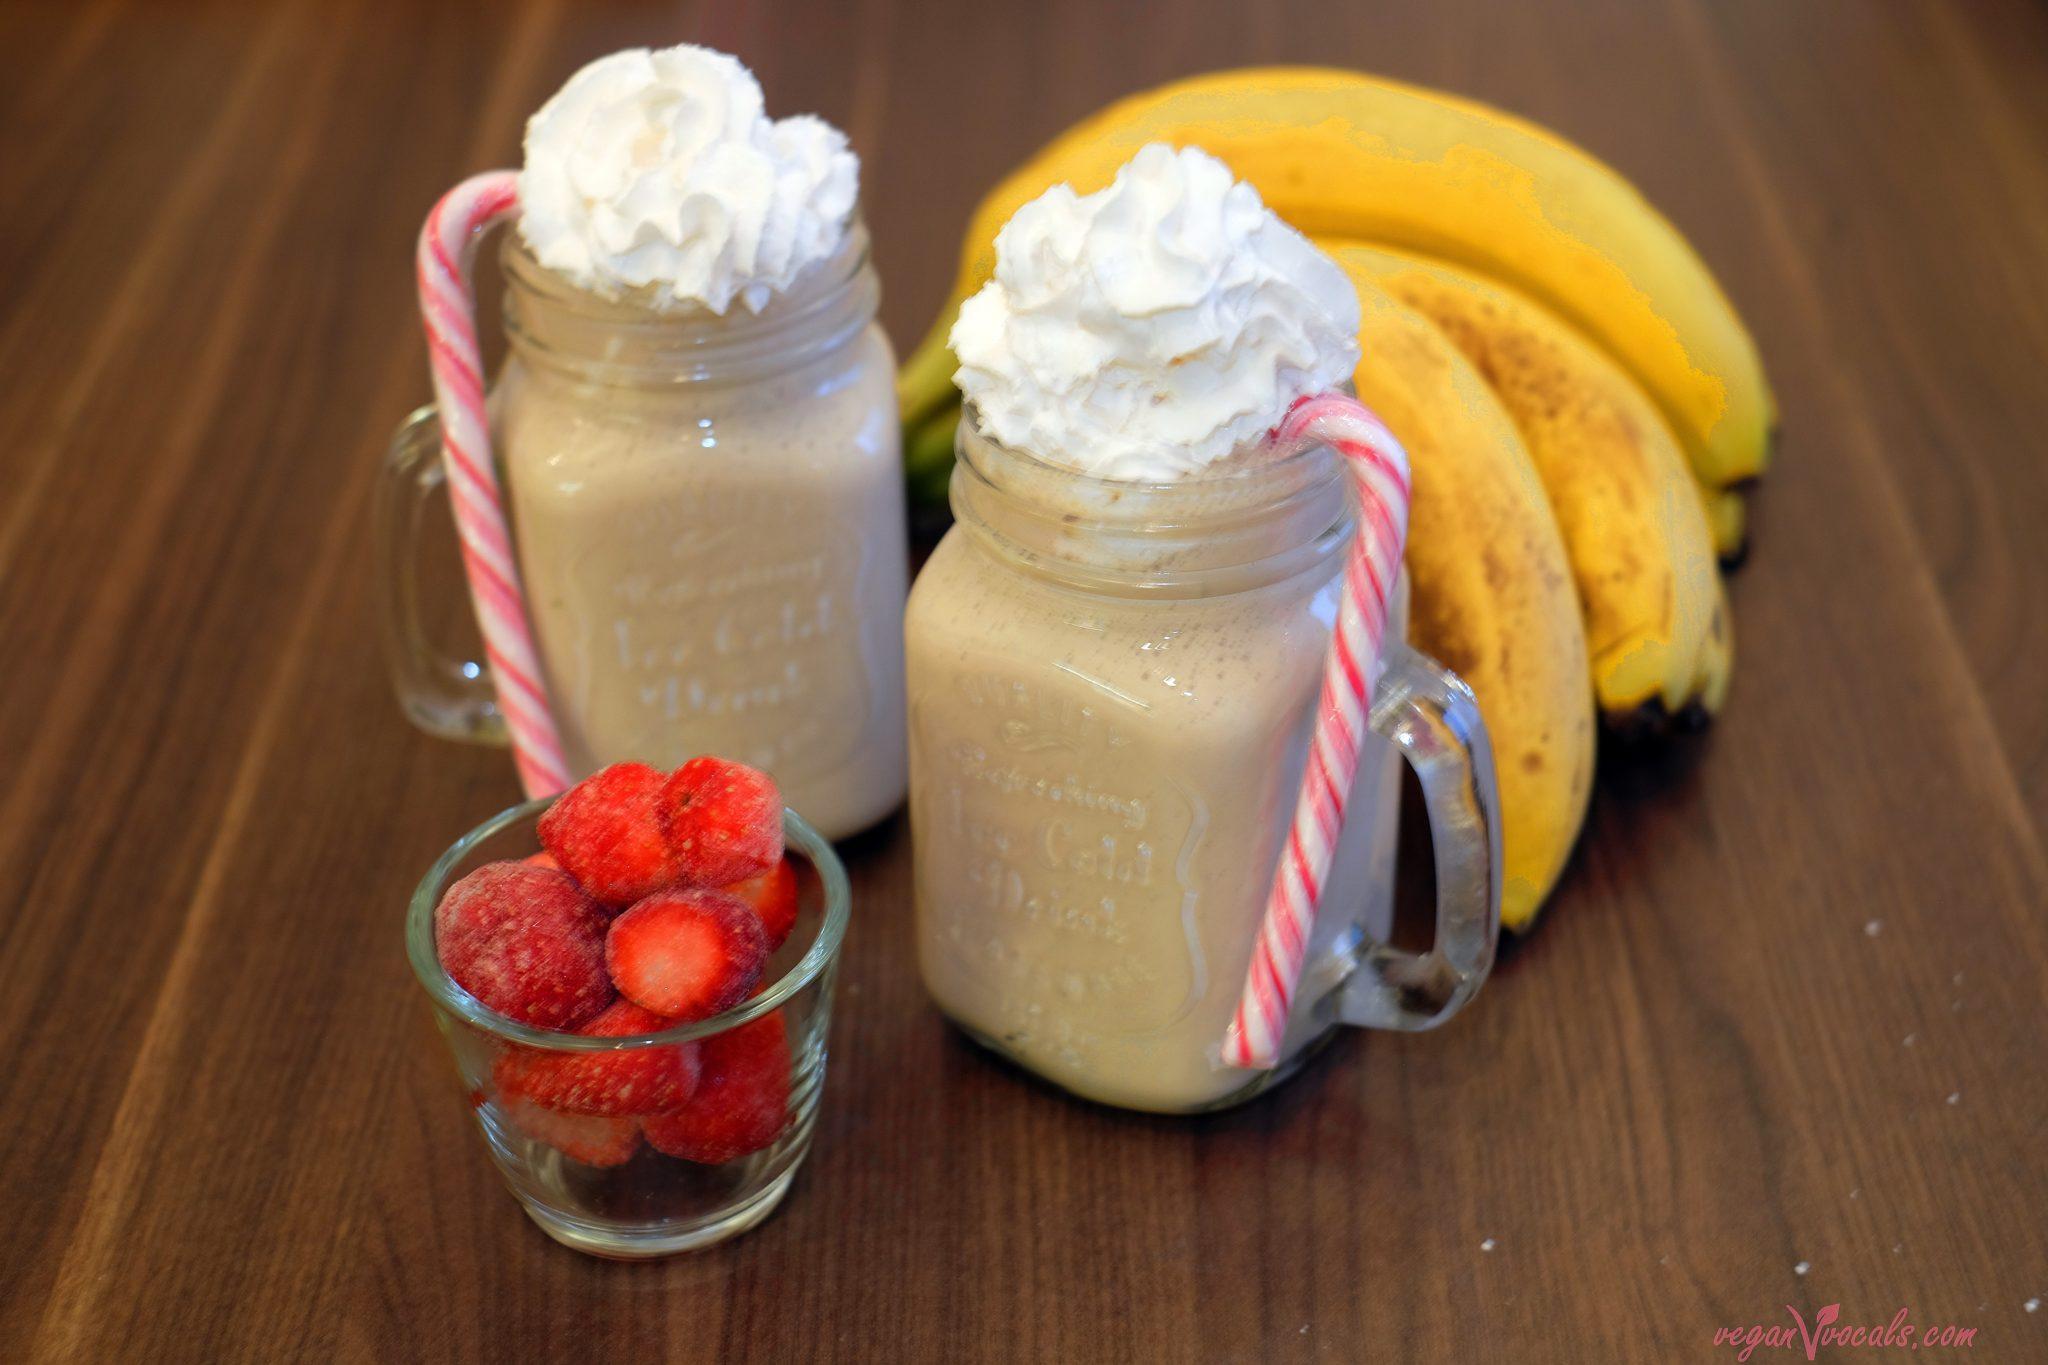 Strawberry and Basil Vegan Milkshake